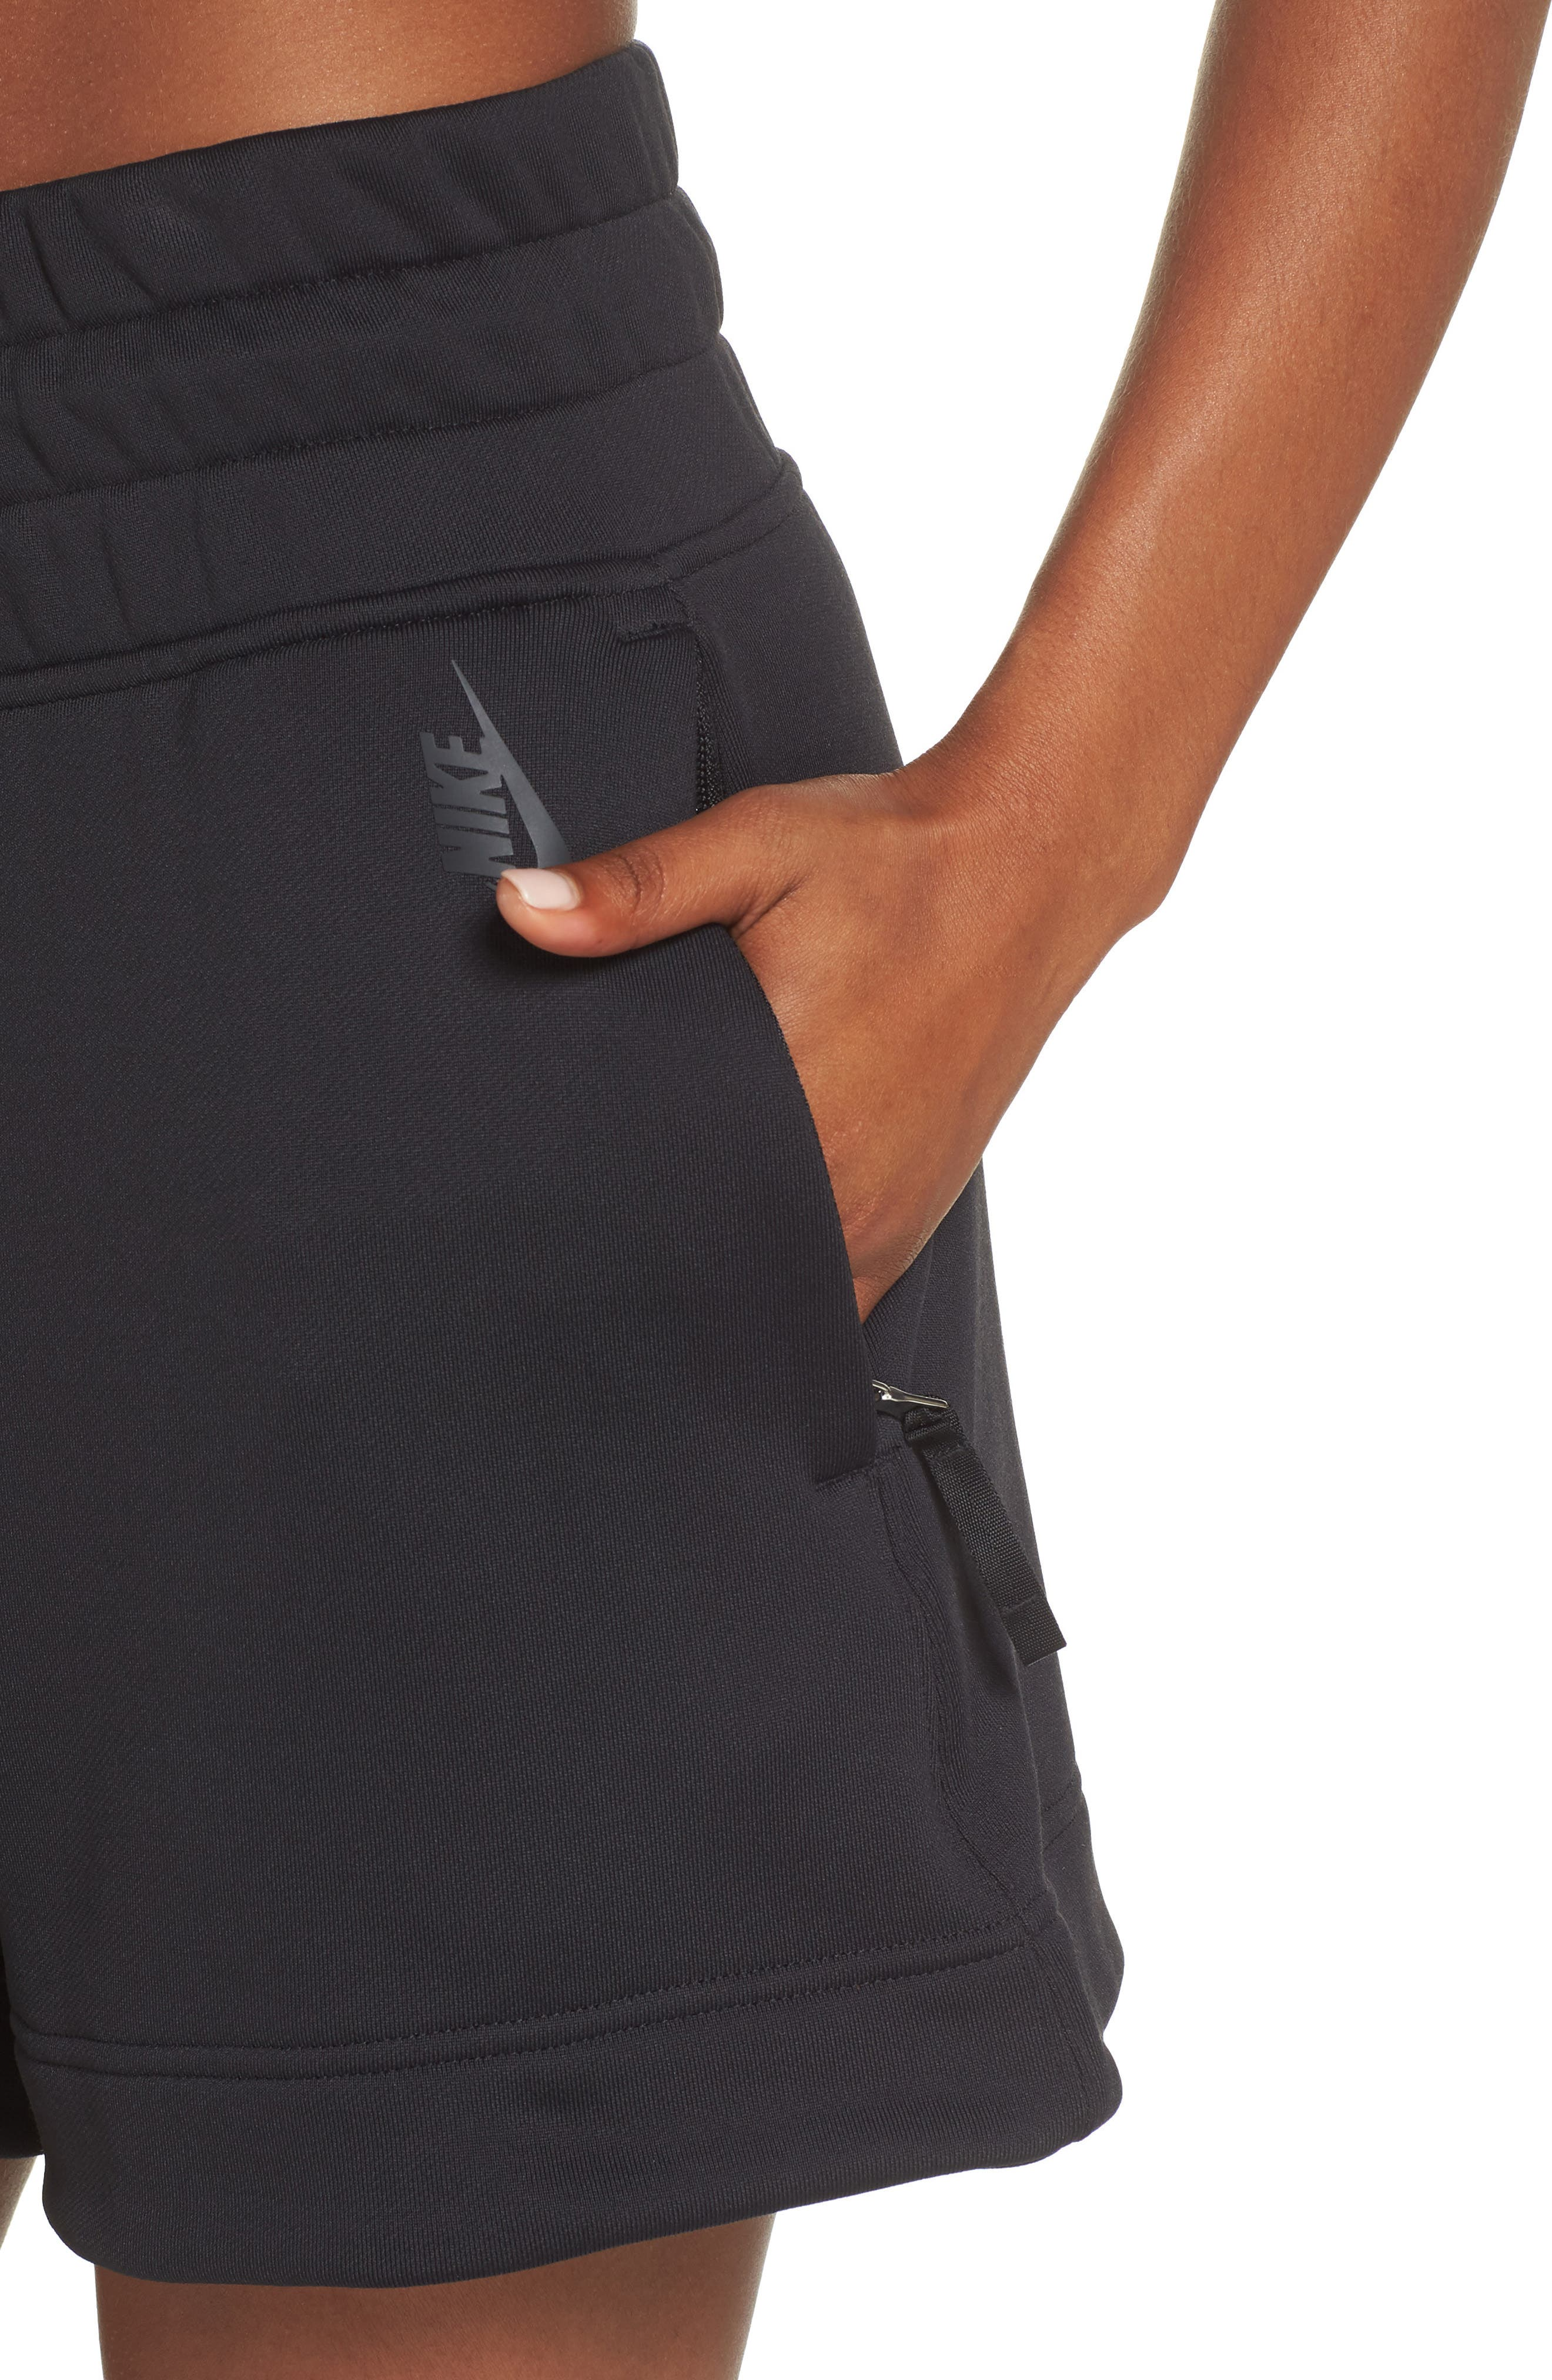 NikeLab Collection Women's Fleece Shorts,                             Alternate thumbnail 4, color,                             BLACK/ BLACK